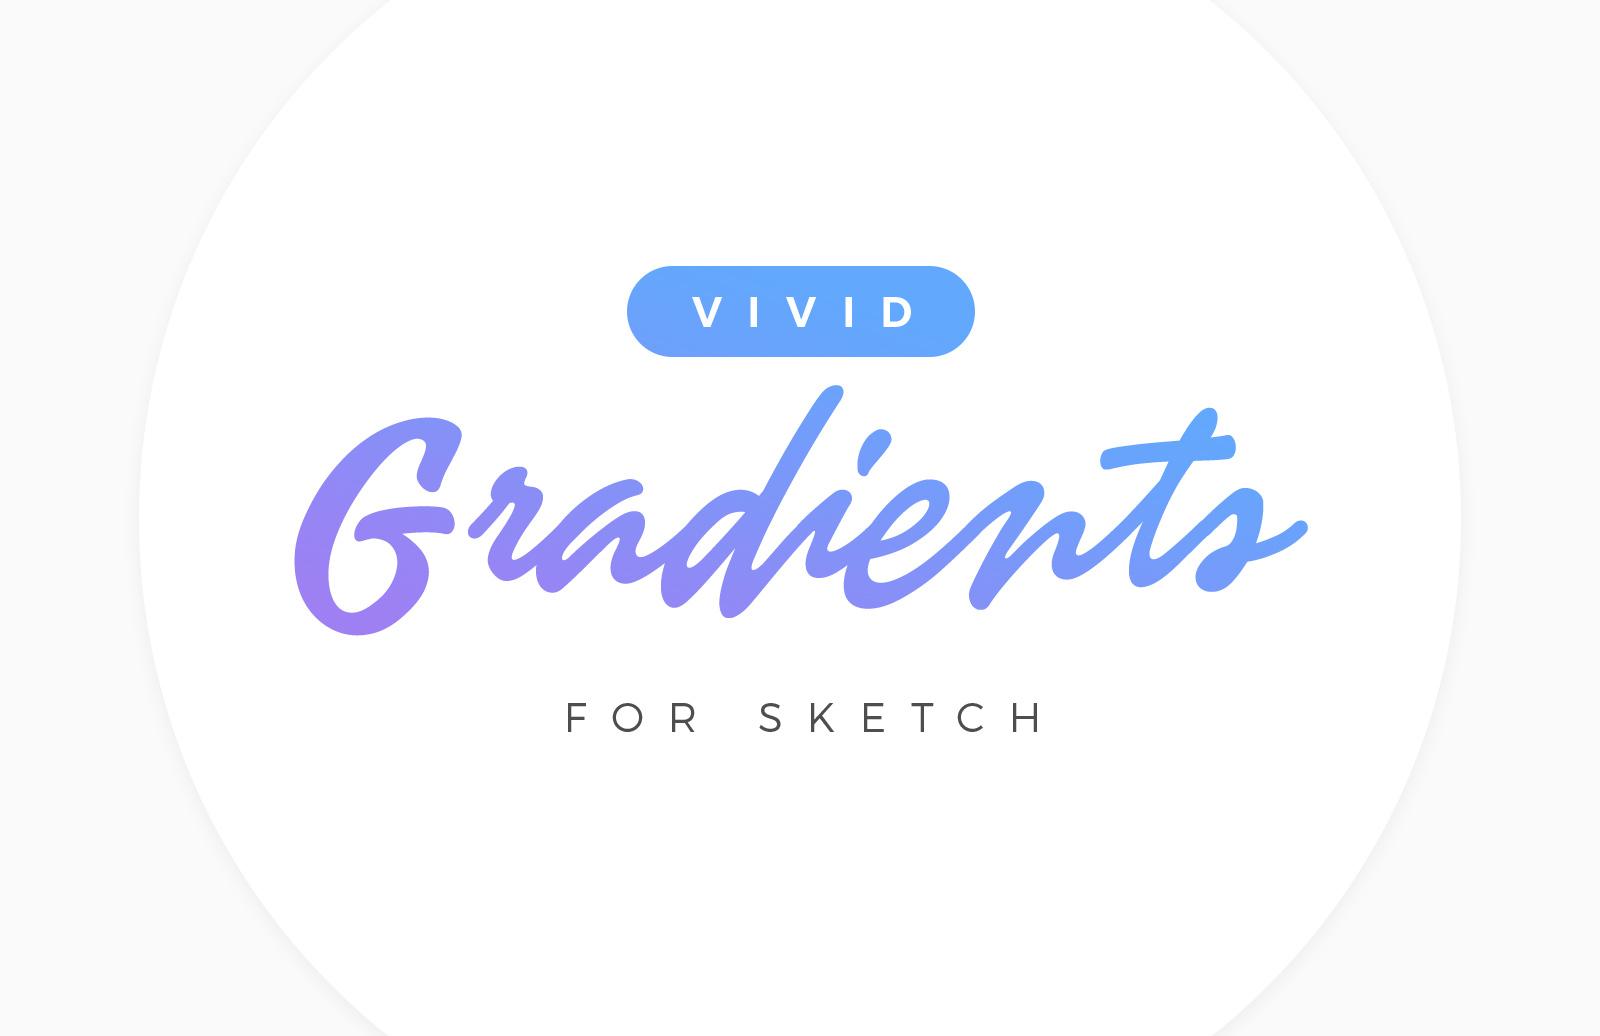 Vivid Gradients For Sketch Preview 1